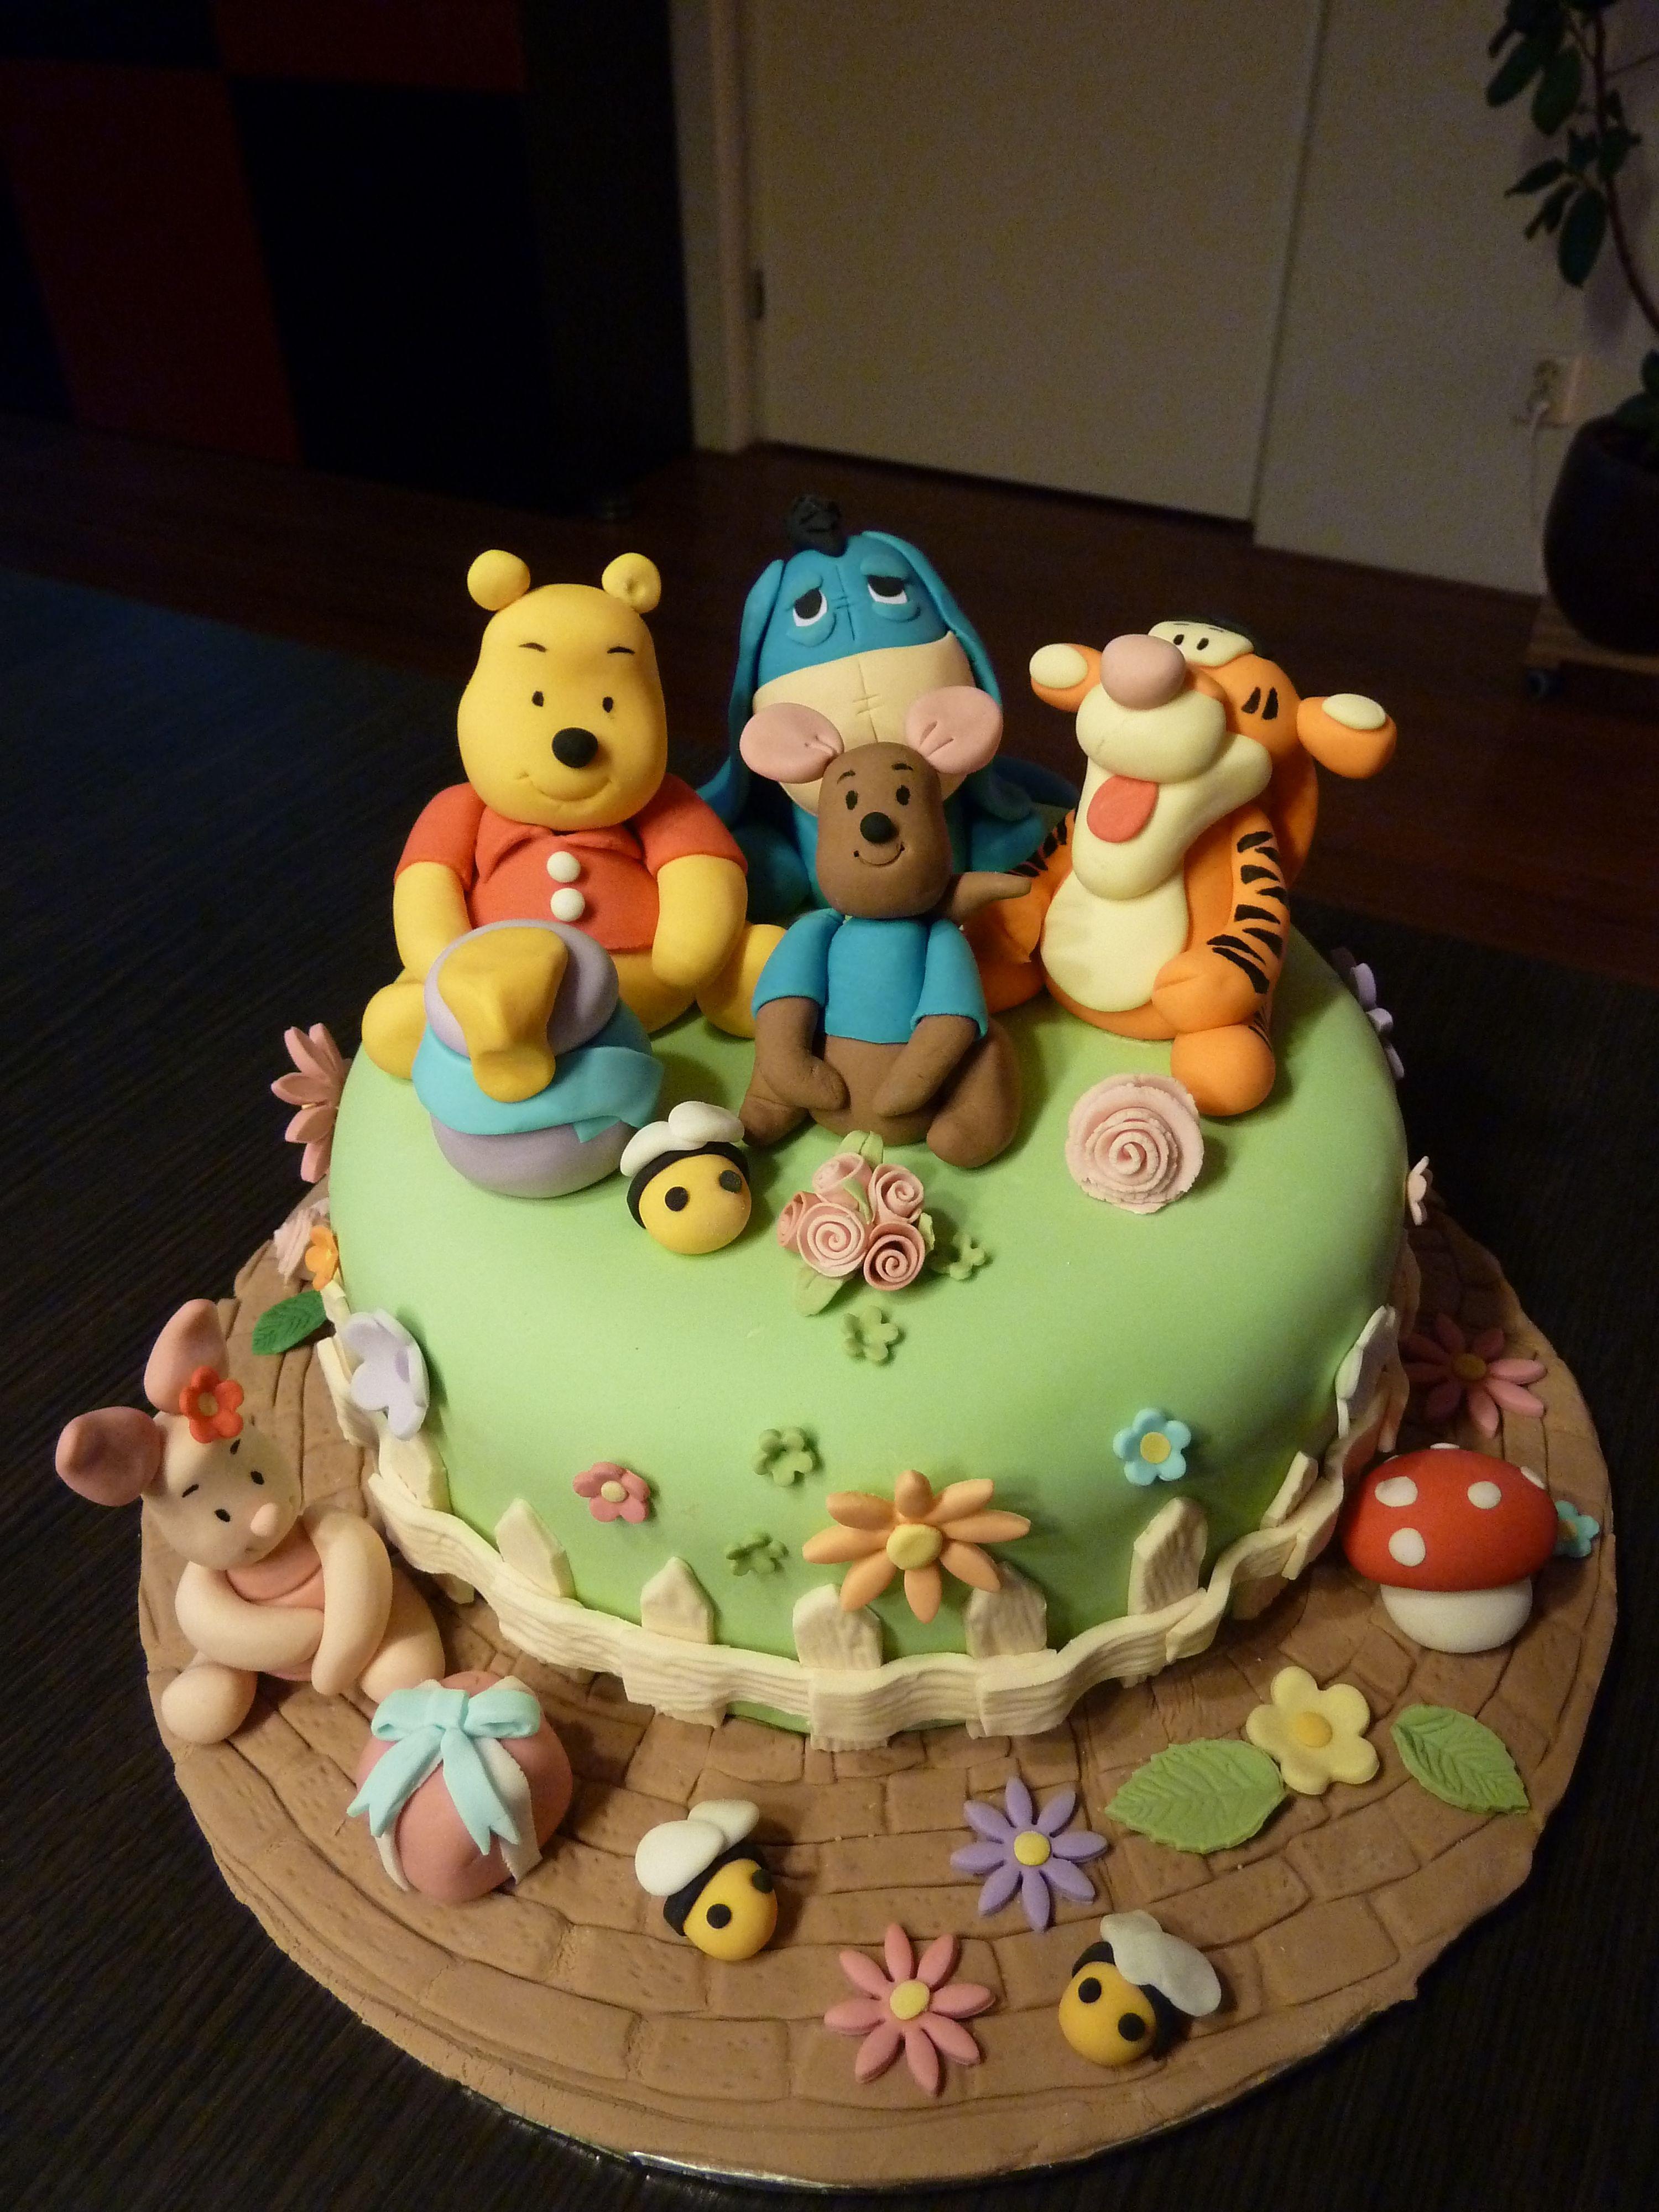 Winnie de pooh and friends cake friends cake baby